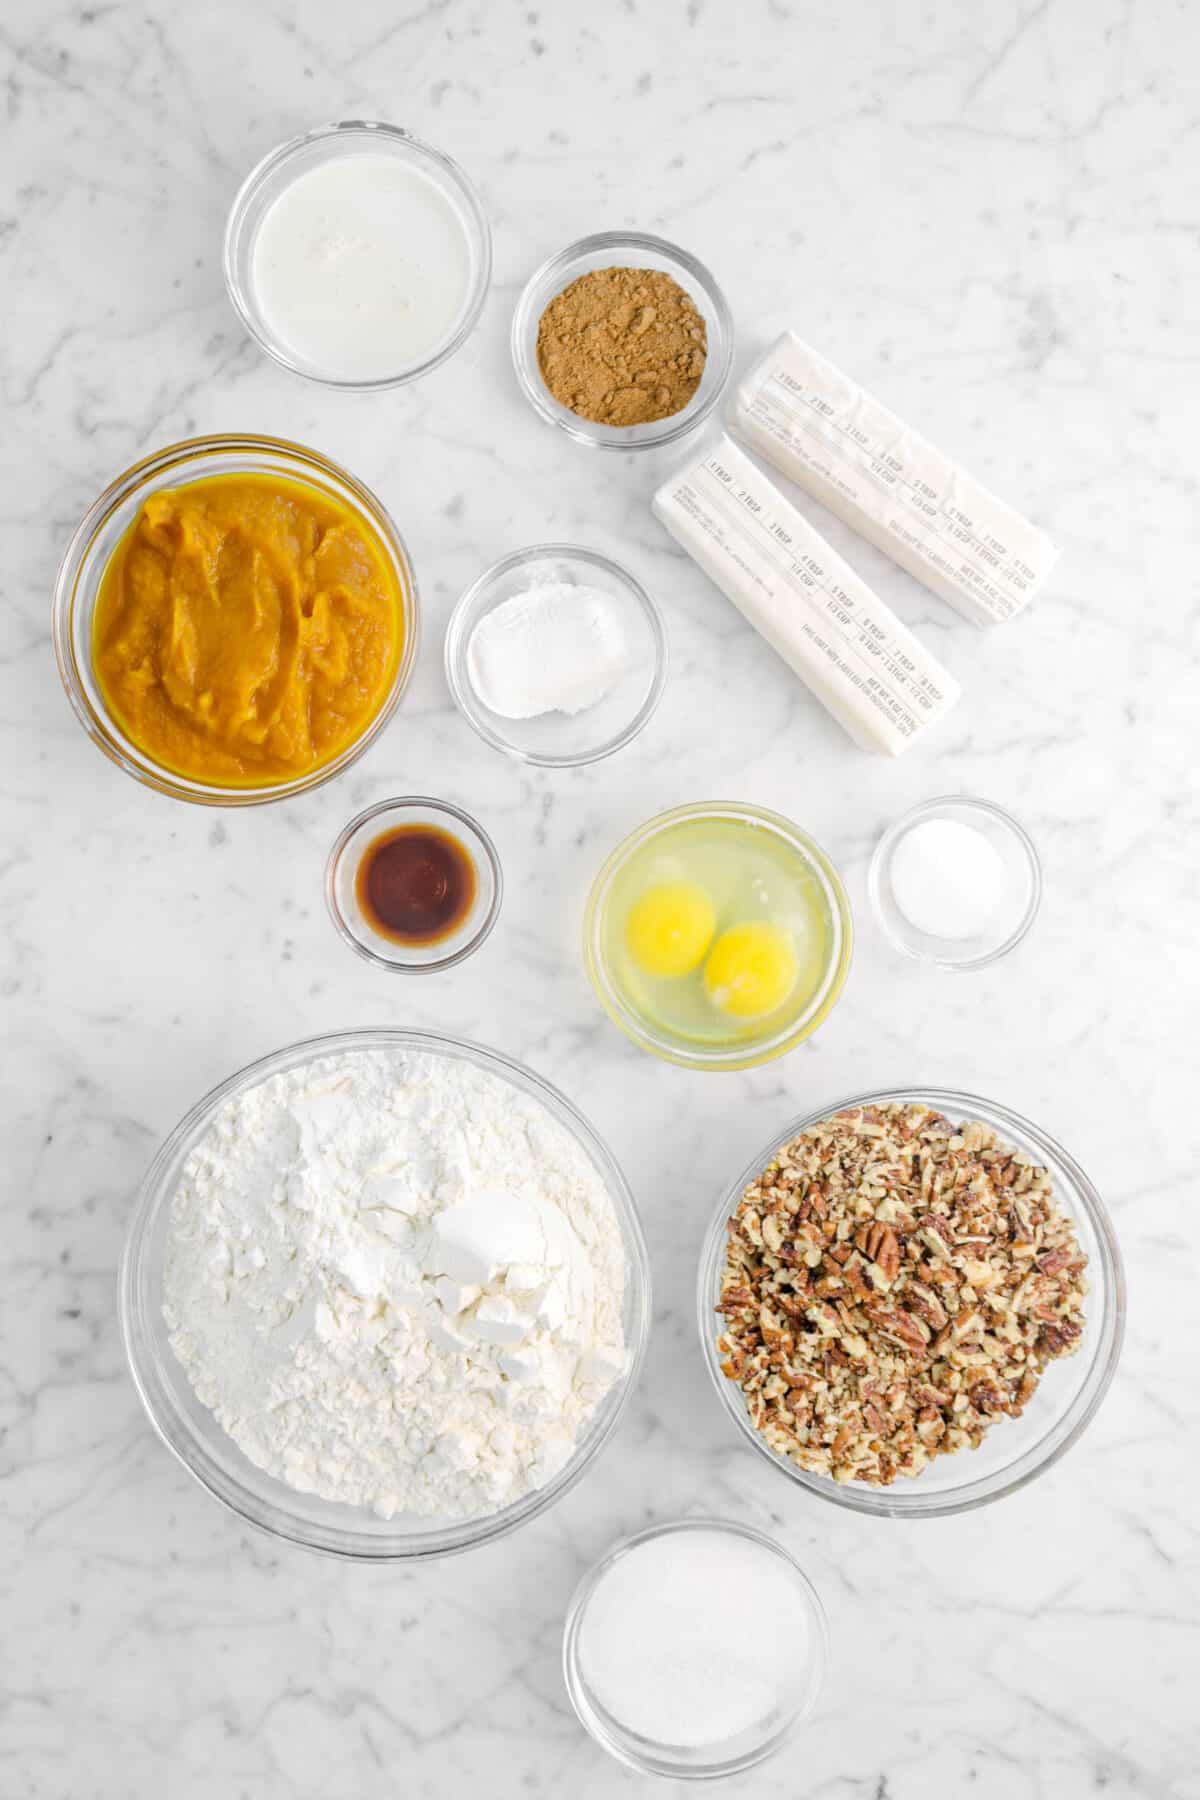 cream, spices, butter, pumpkin, baking powder, vanilla, eggs, salt, flour, pecans, and sugar on marble counter